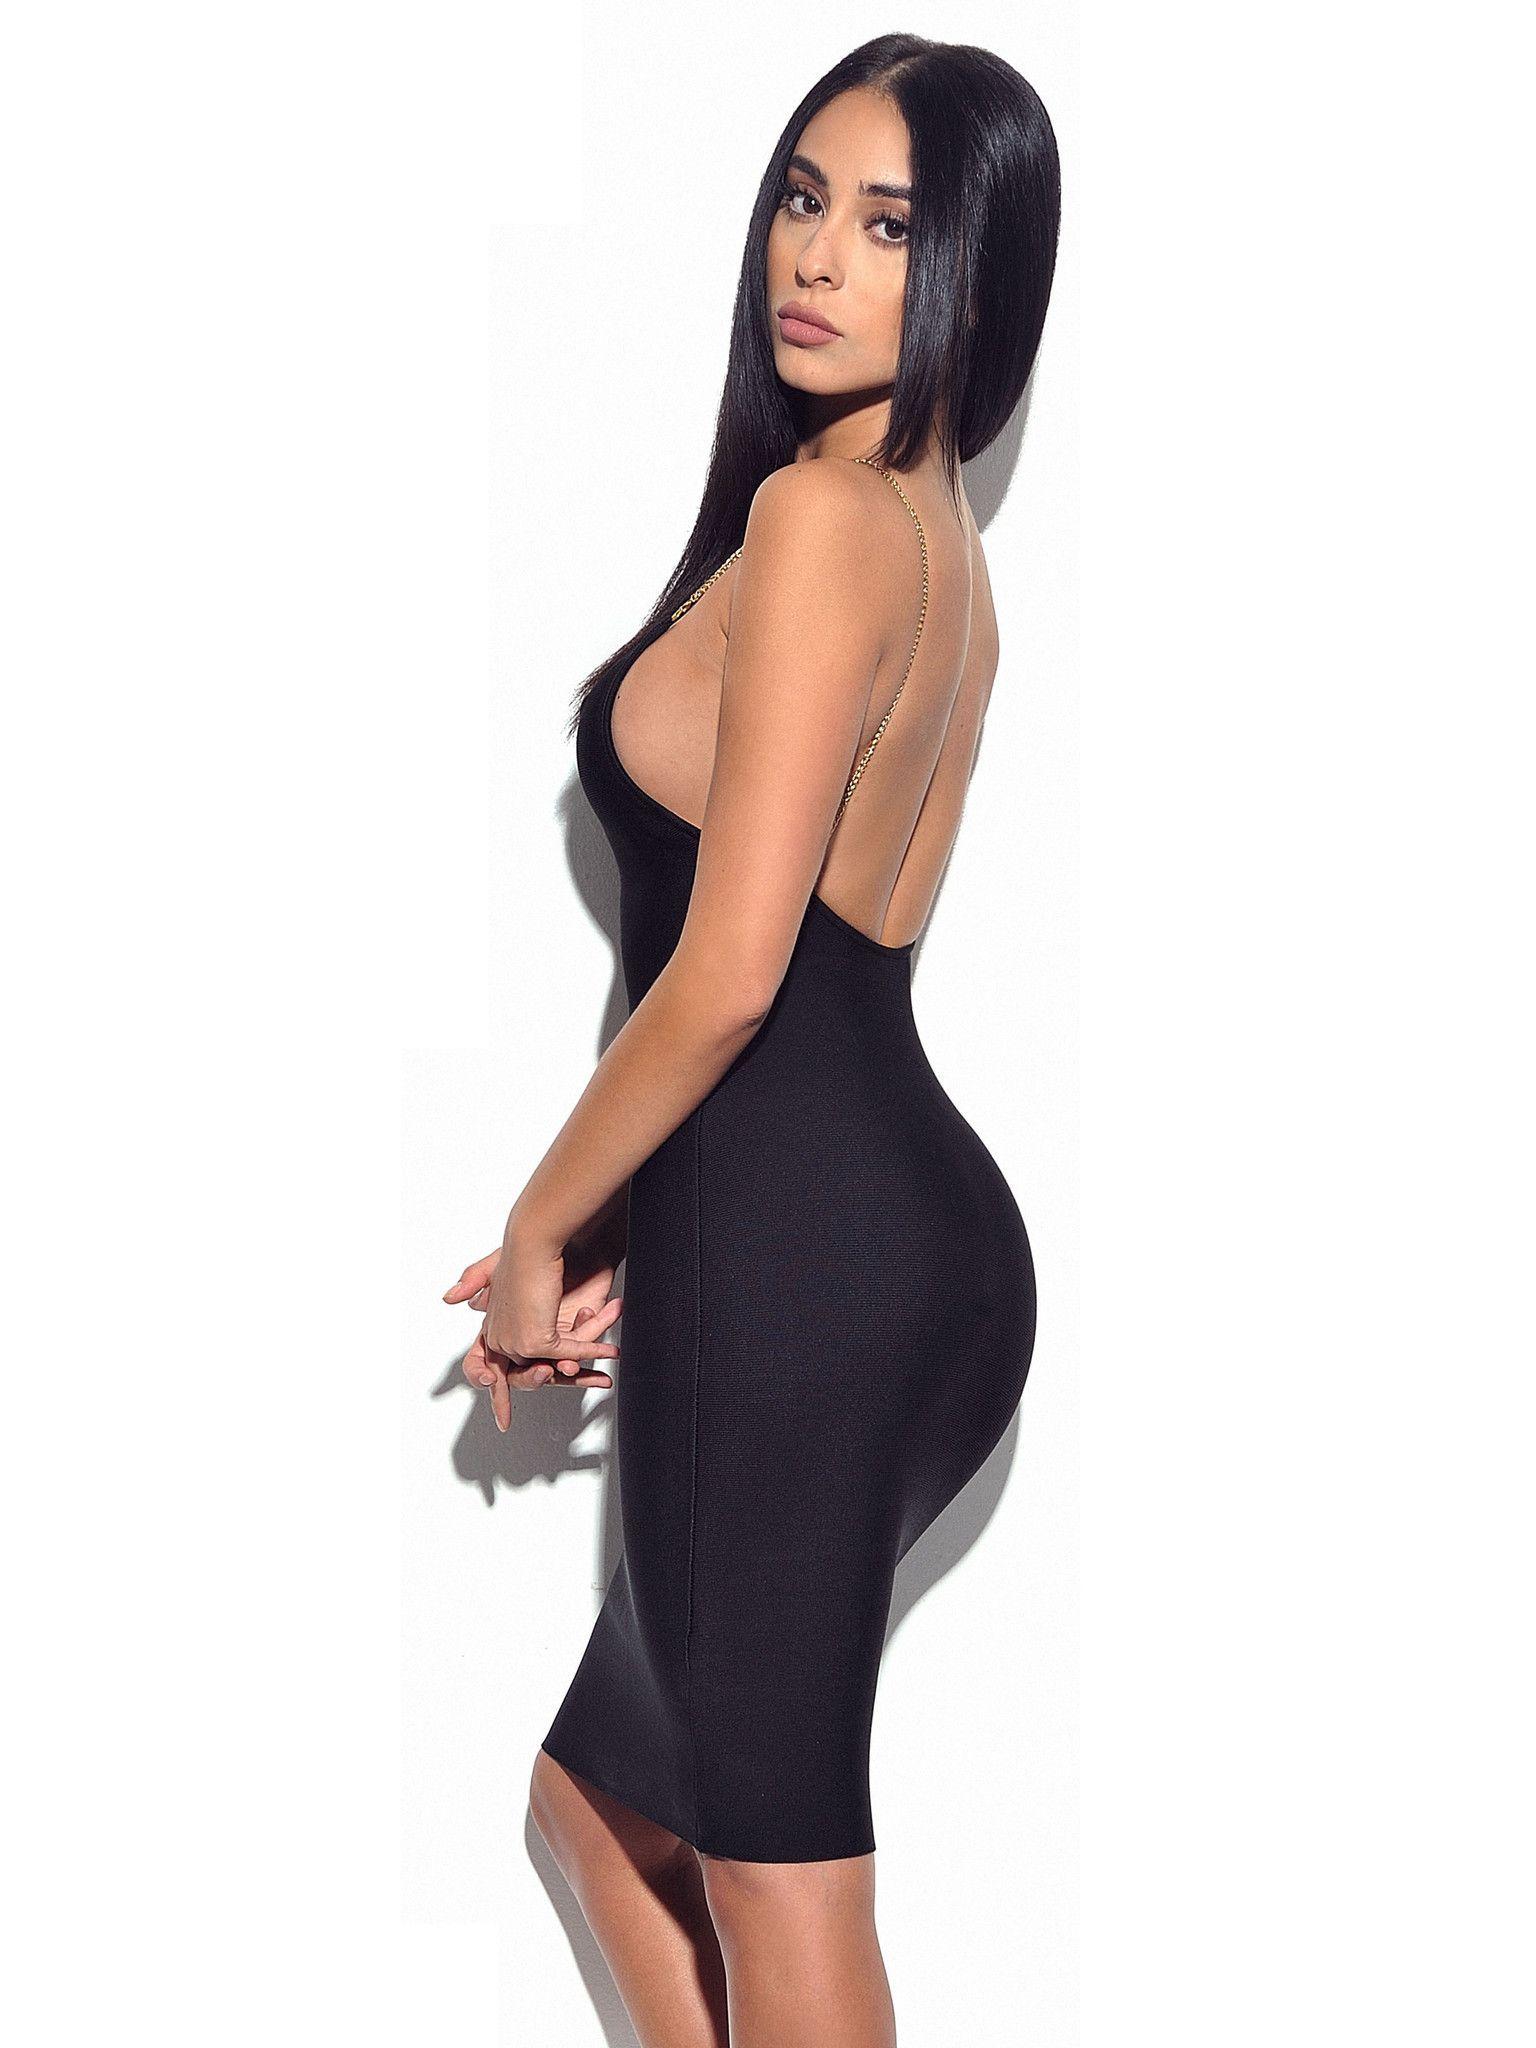 4e63a4639f01 Yolanda Backless Gold Chain Strap Black Bandage Dress – Miss Circle ...